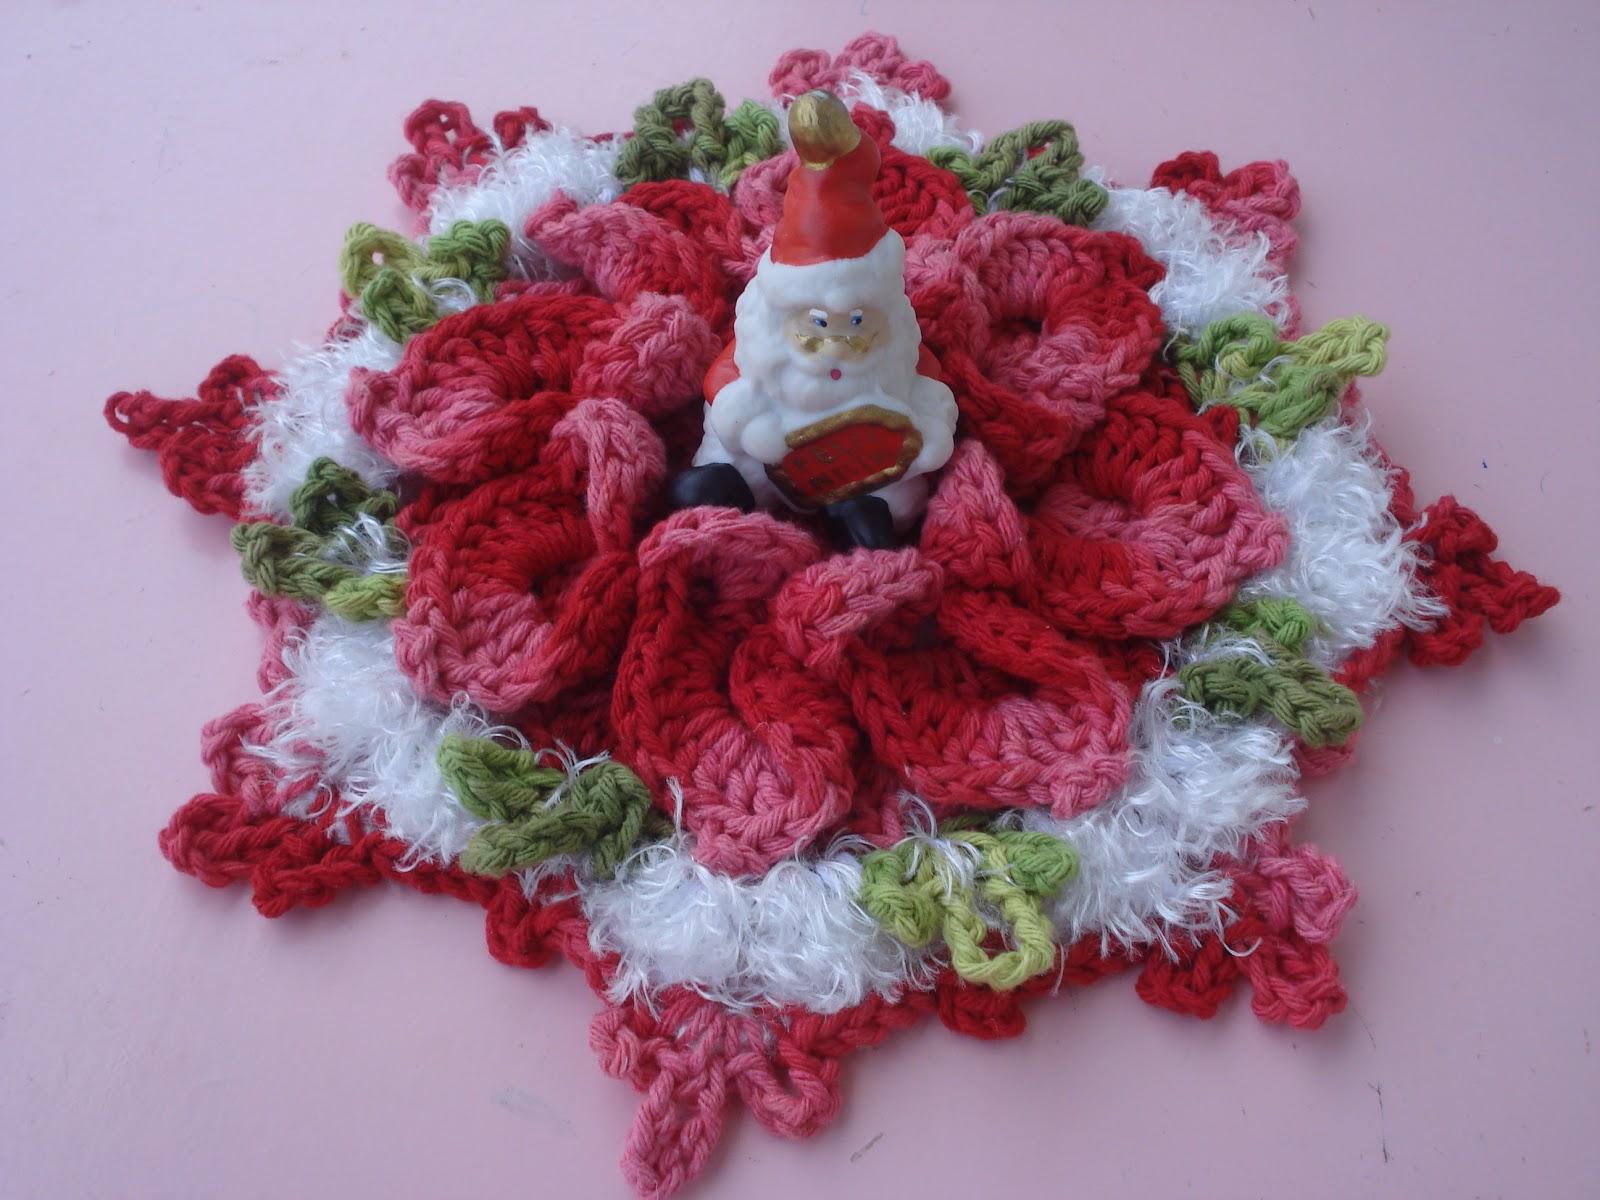 flor e desta base pode se desenvolver diversos trabalhos